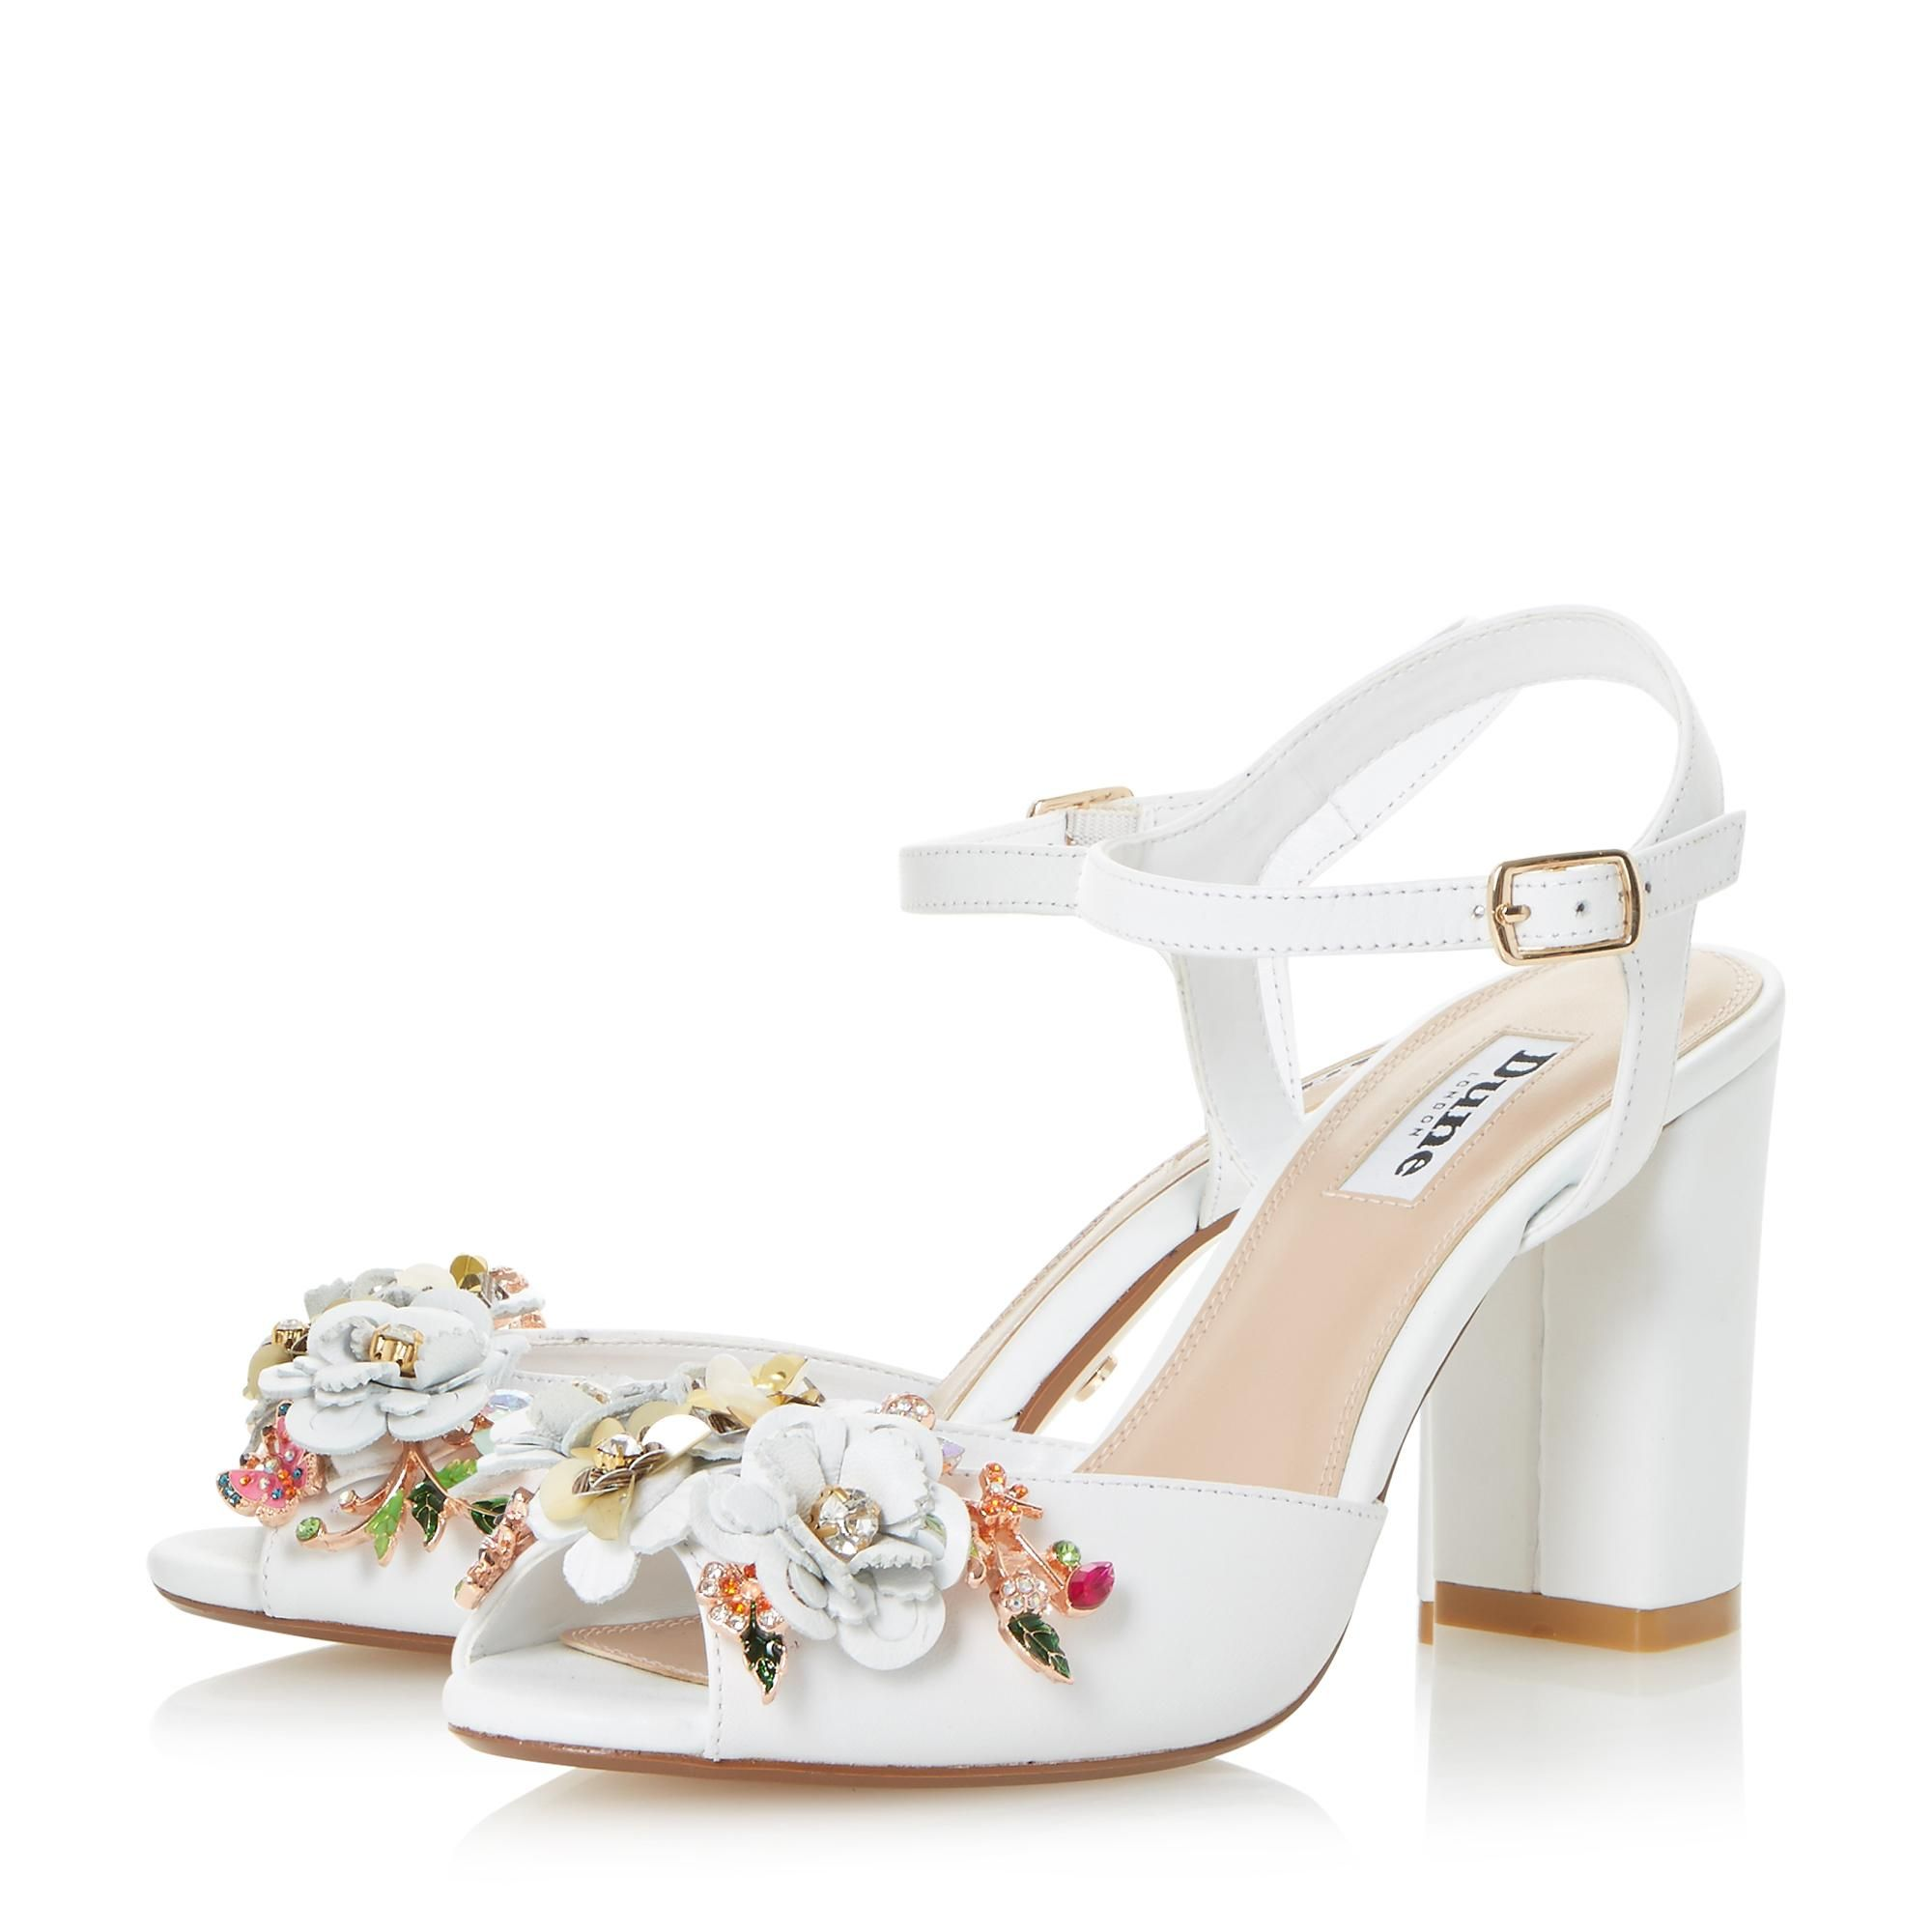 Mackaya Flower Garden Block Heel Sandal Wedding Shoes Block